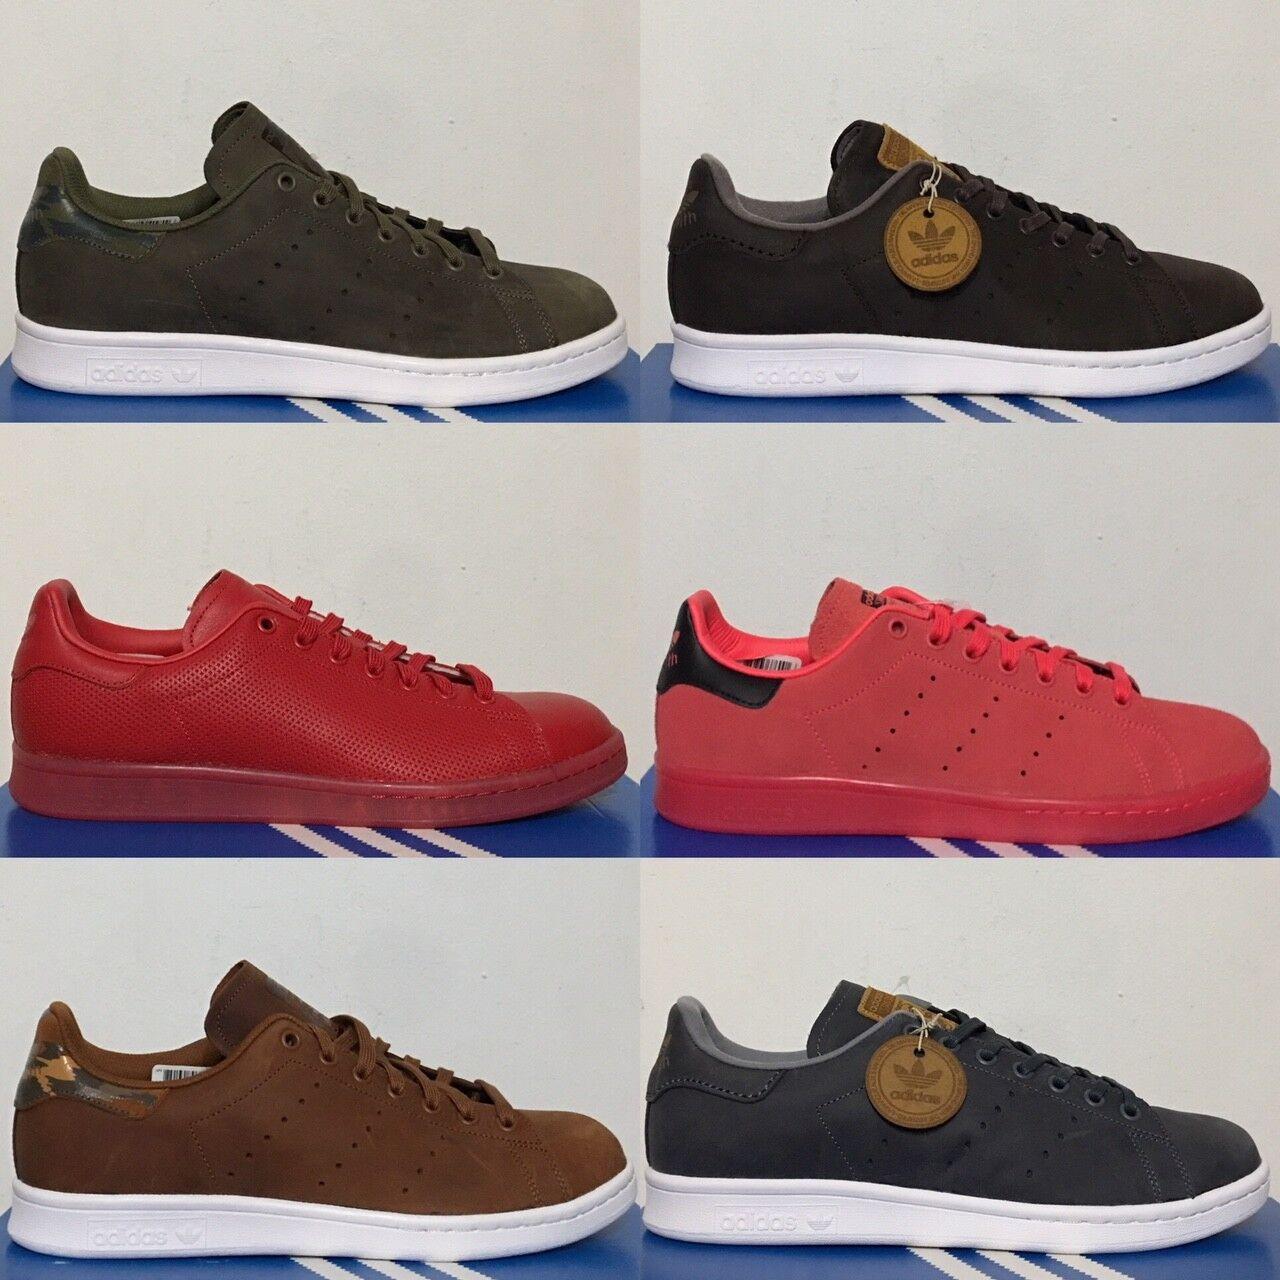 Adidas Originals Casual Stan Smith retro Casual Originals Shoes Casual salvaje c0bd1d